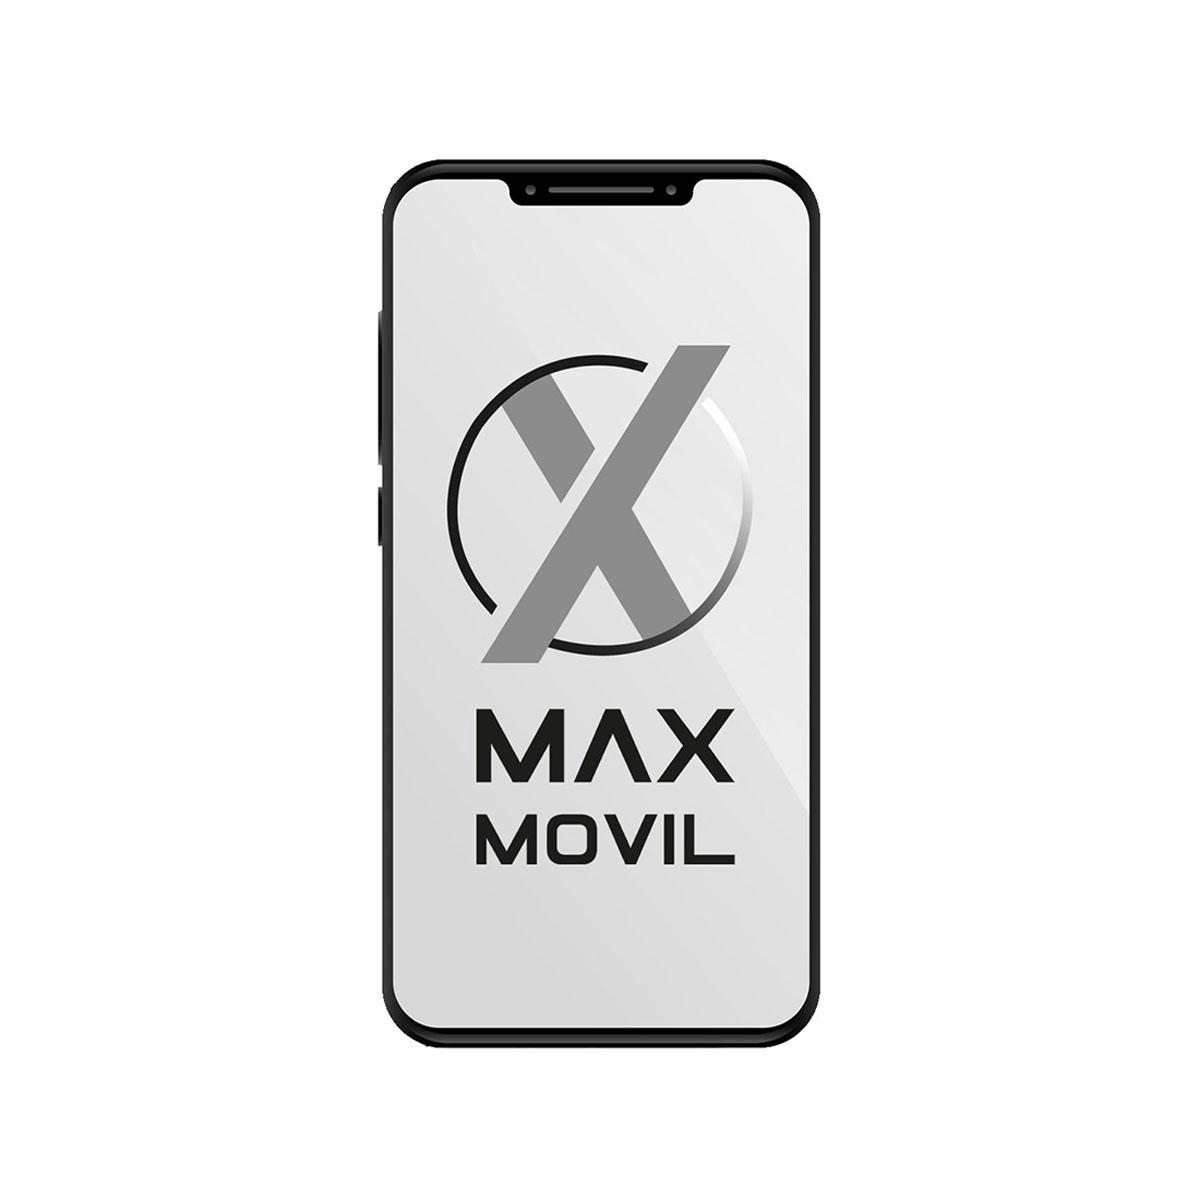 Motorola Edge Plus 12GB/256GB Gris (Grey) Single SIM XT2061-3